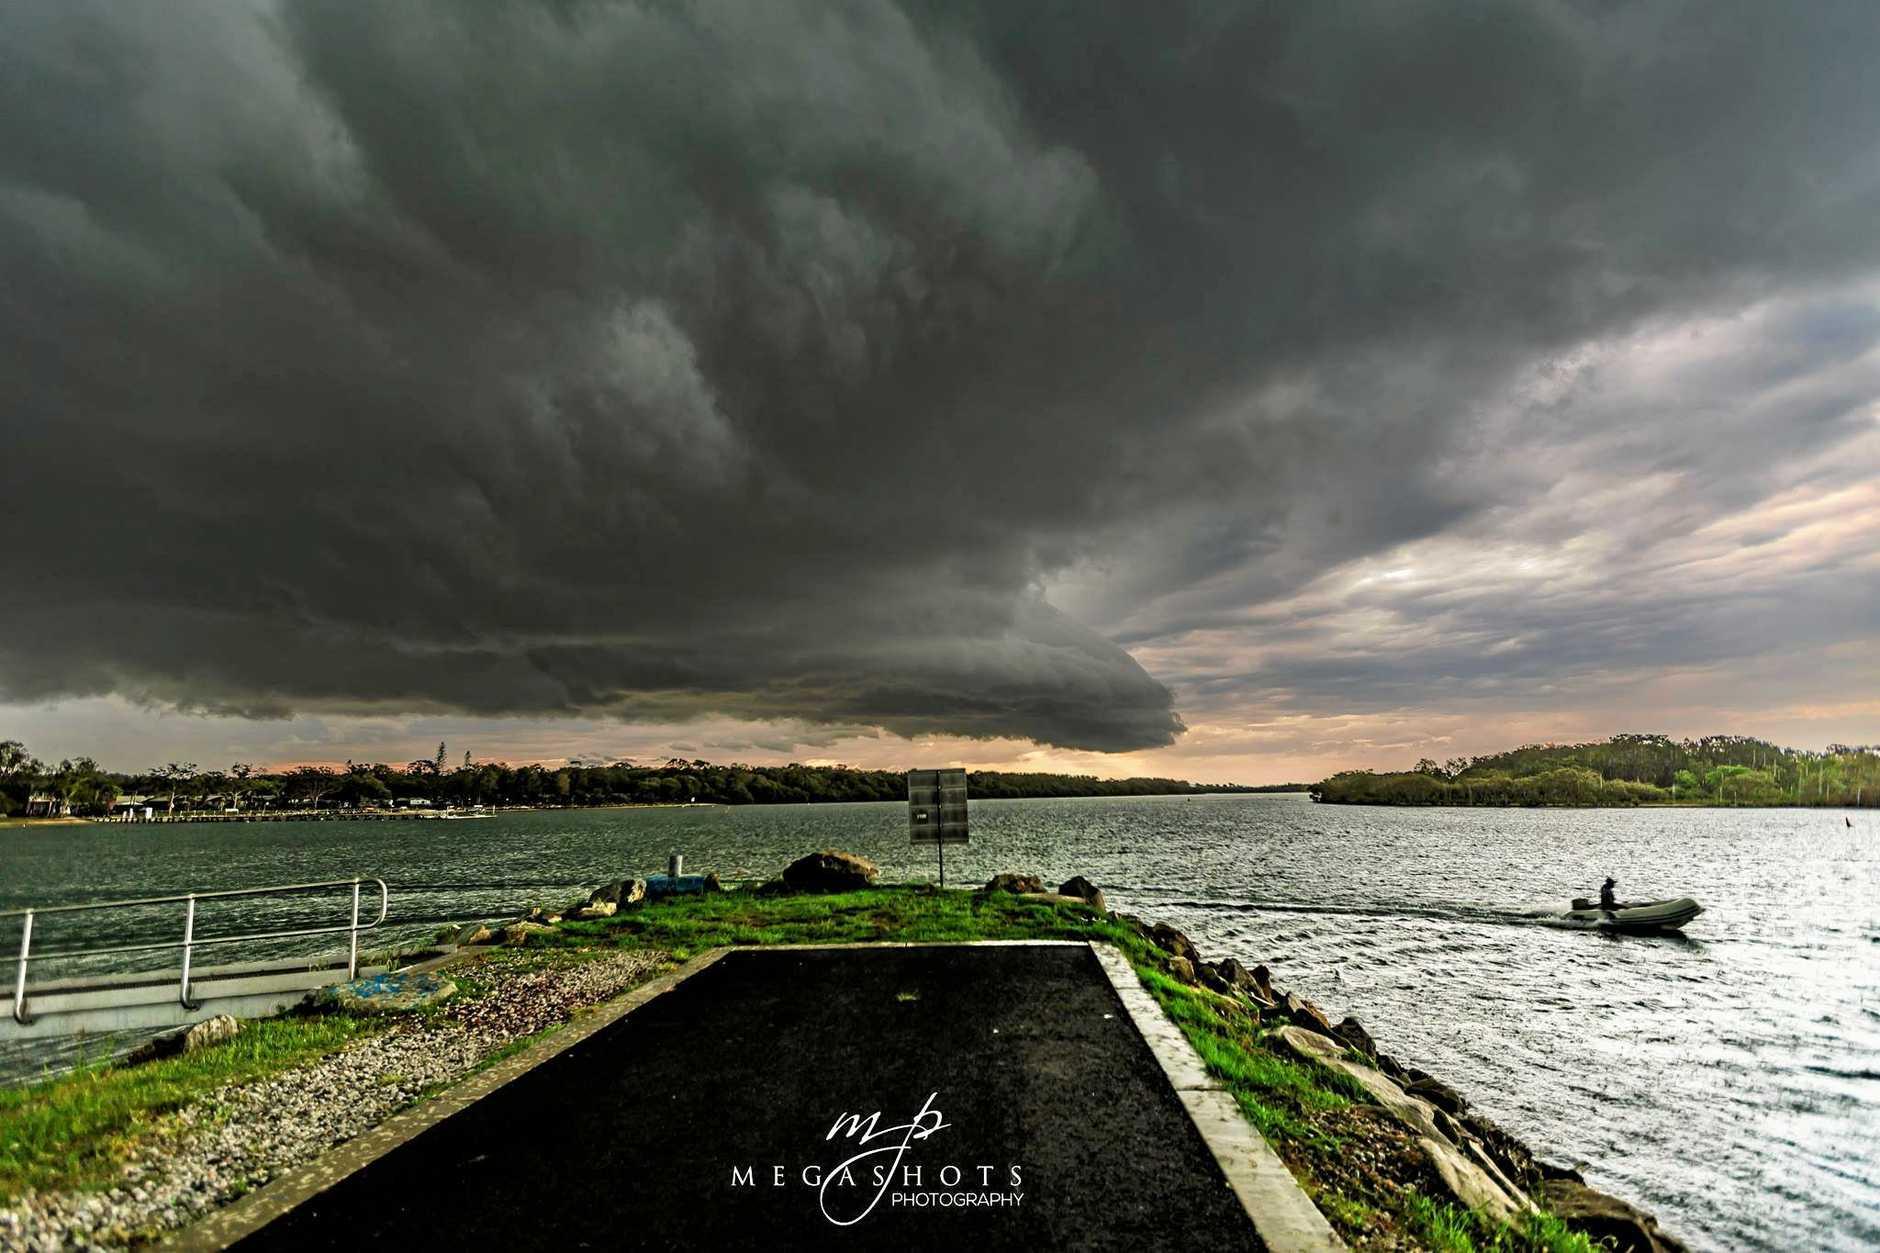 A large storm makes its way towards Yamba.